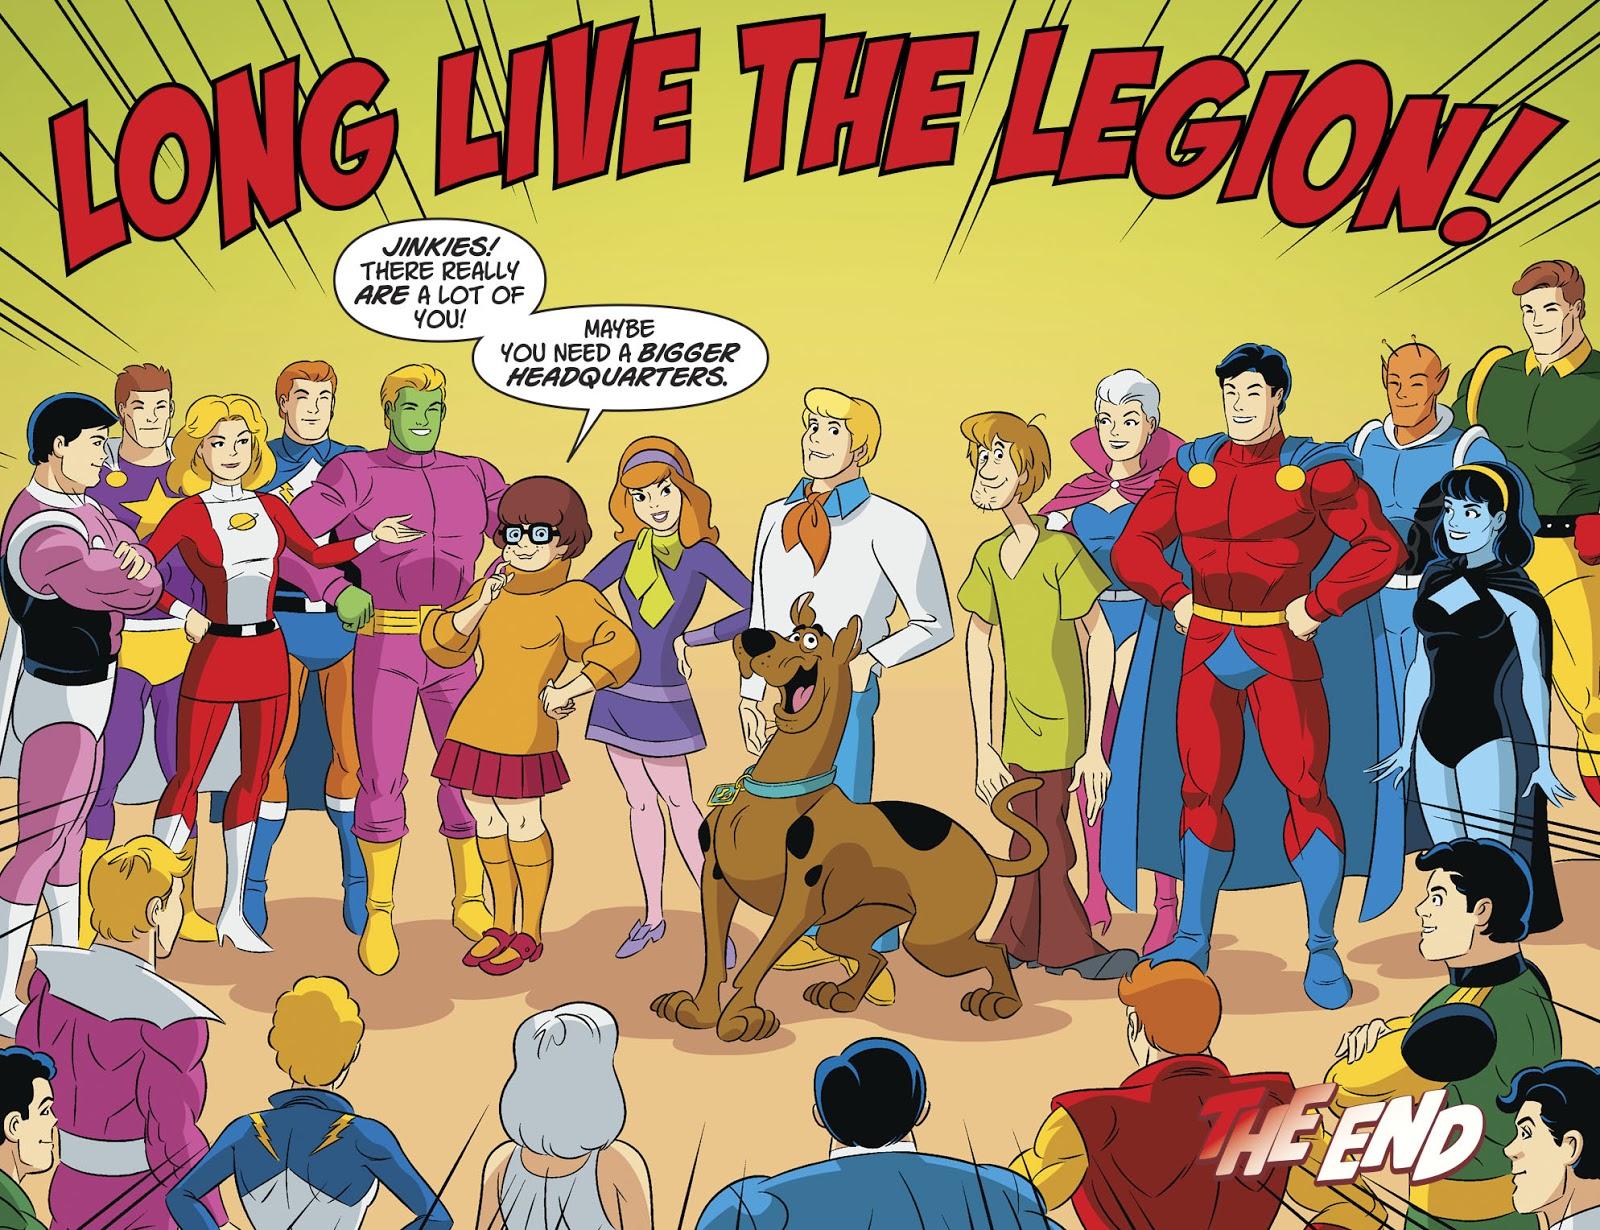 Legion of Super-Heroes (Scooby-Doo Team-Up)